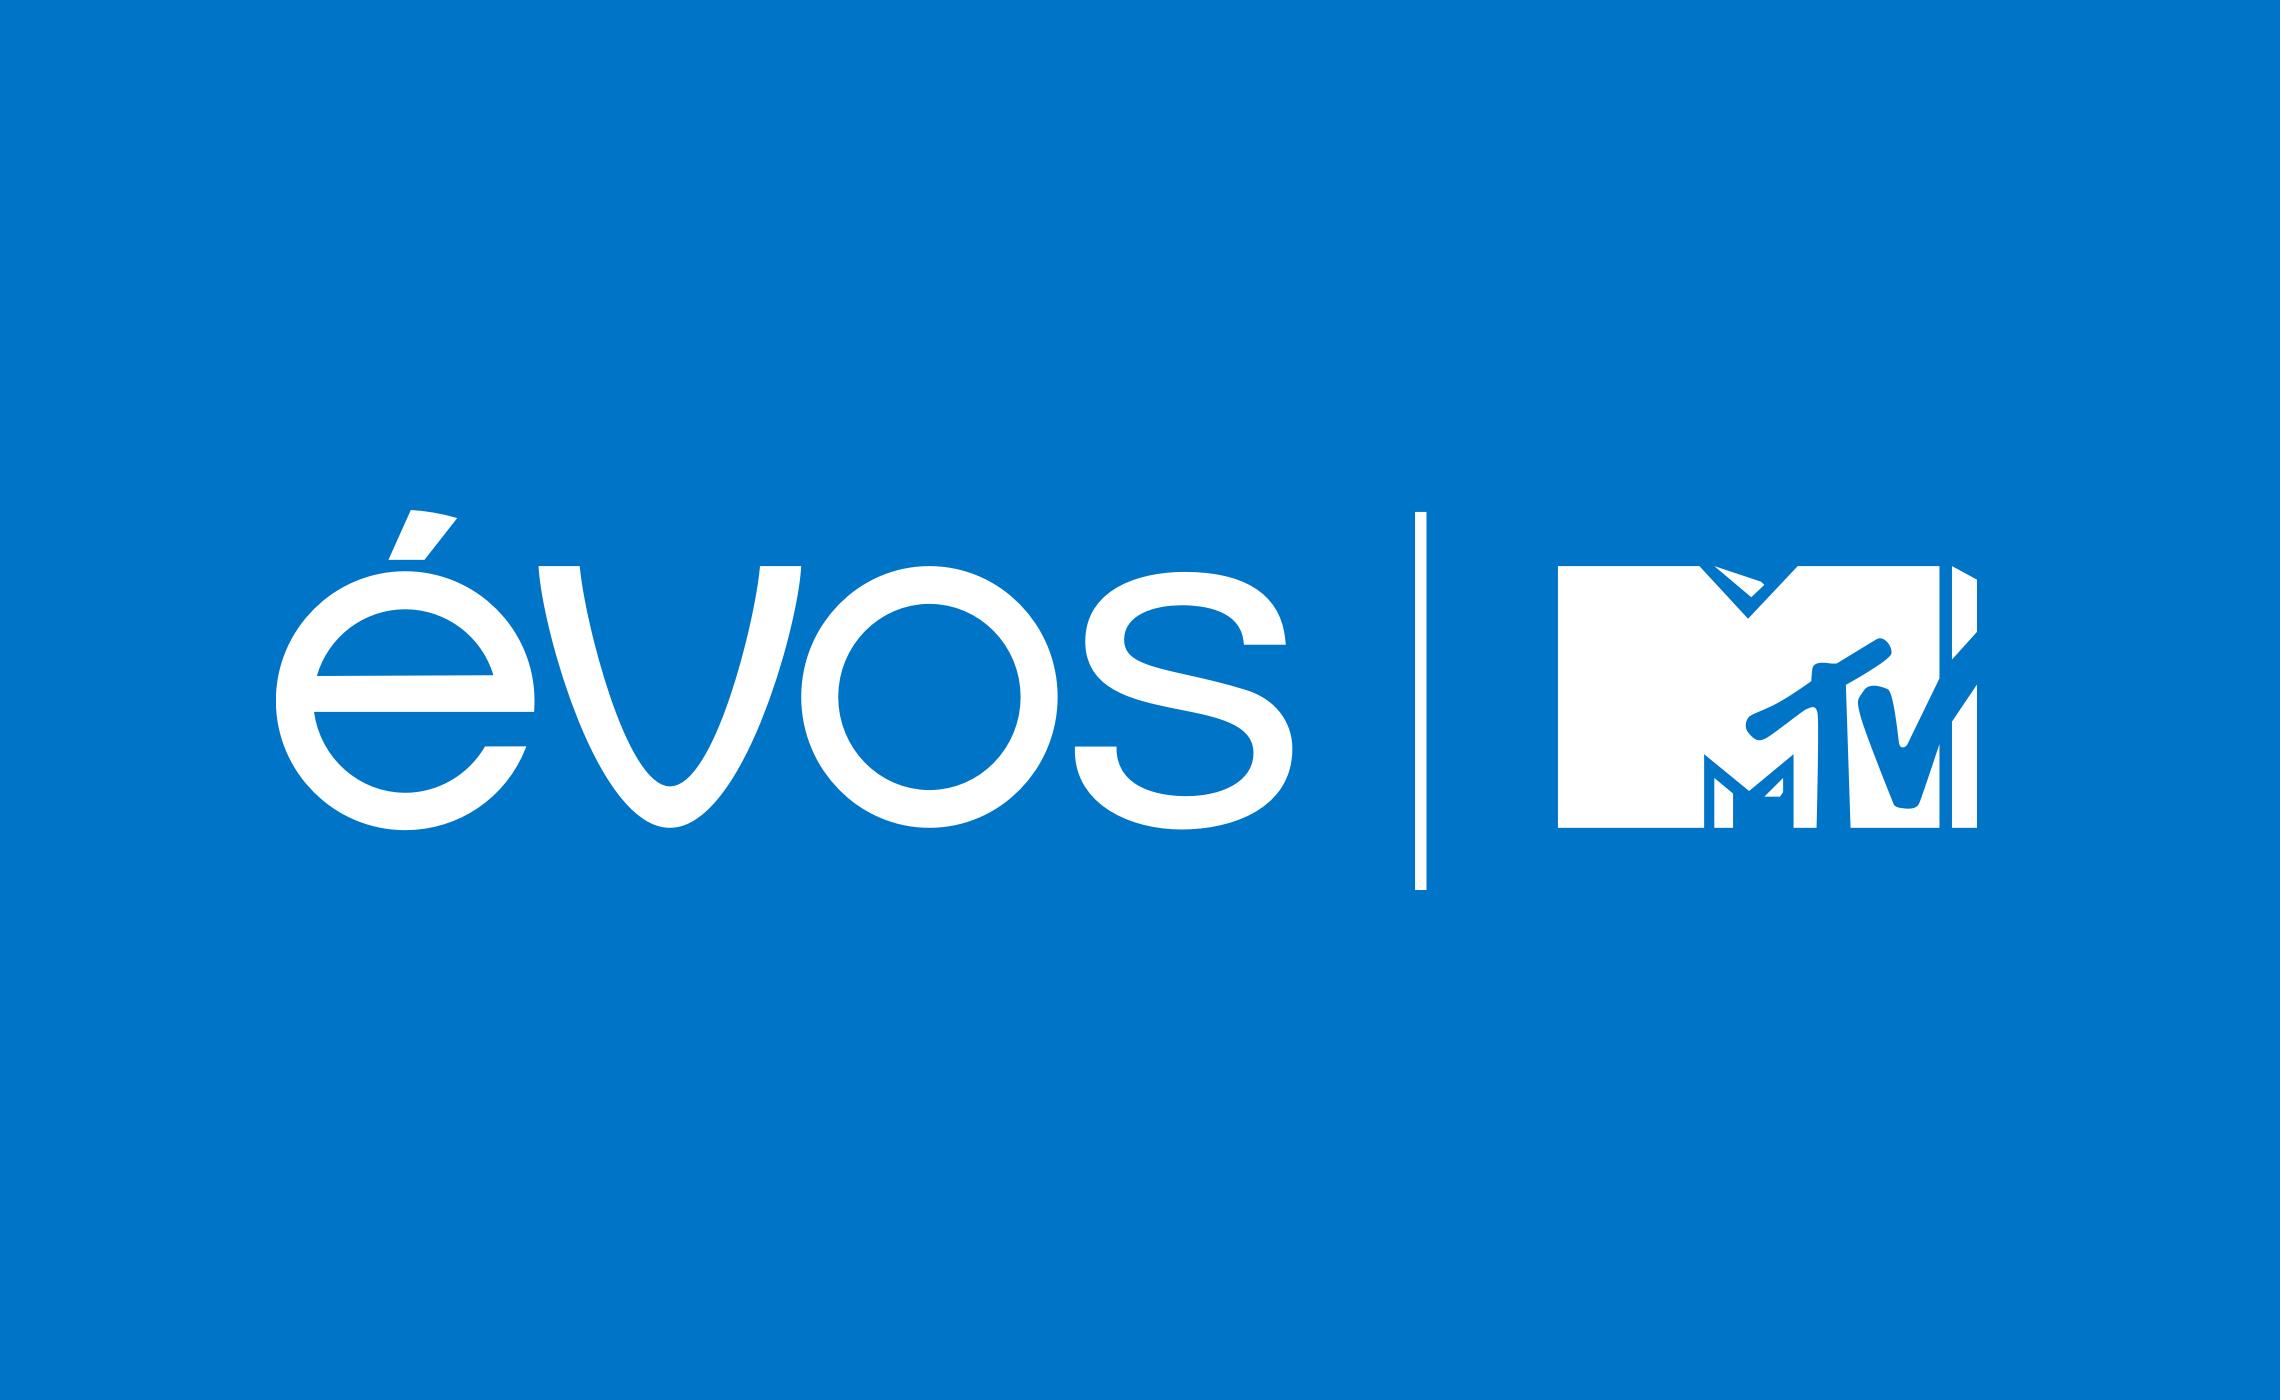 Évos   MTV – branding